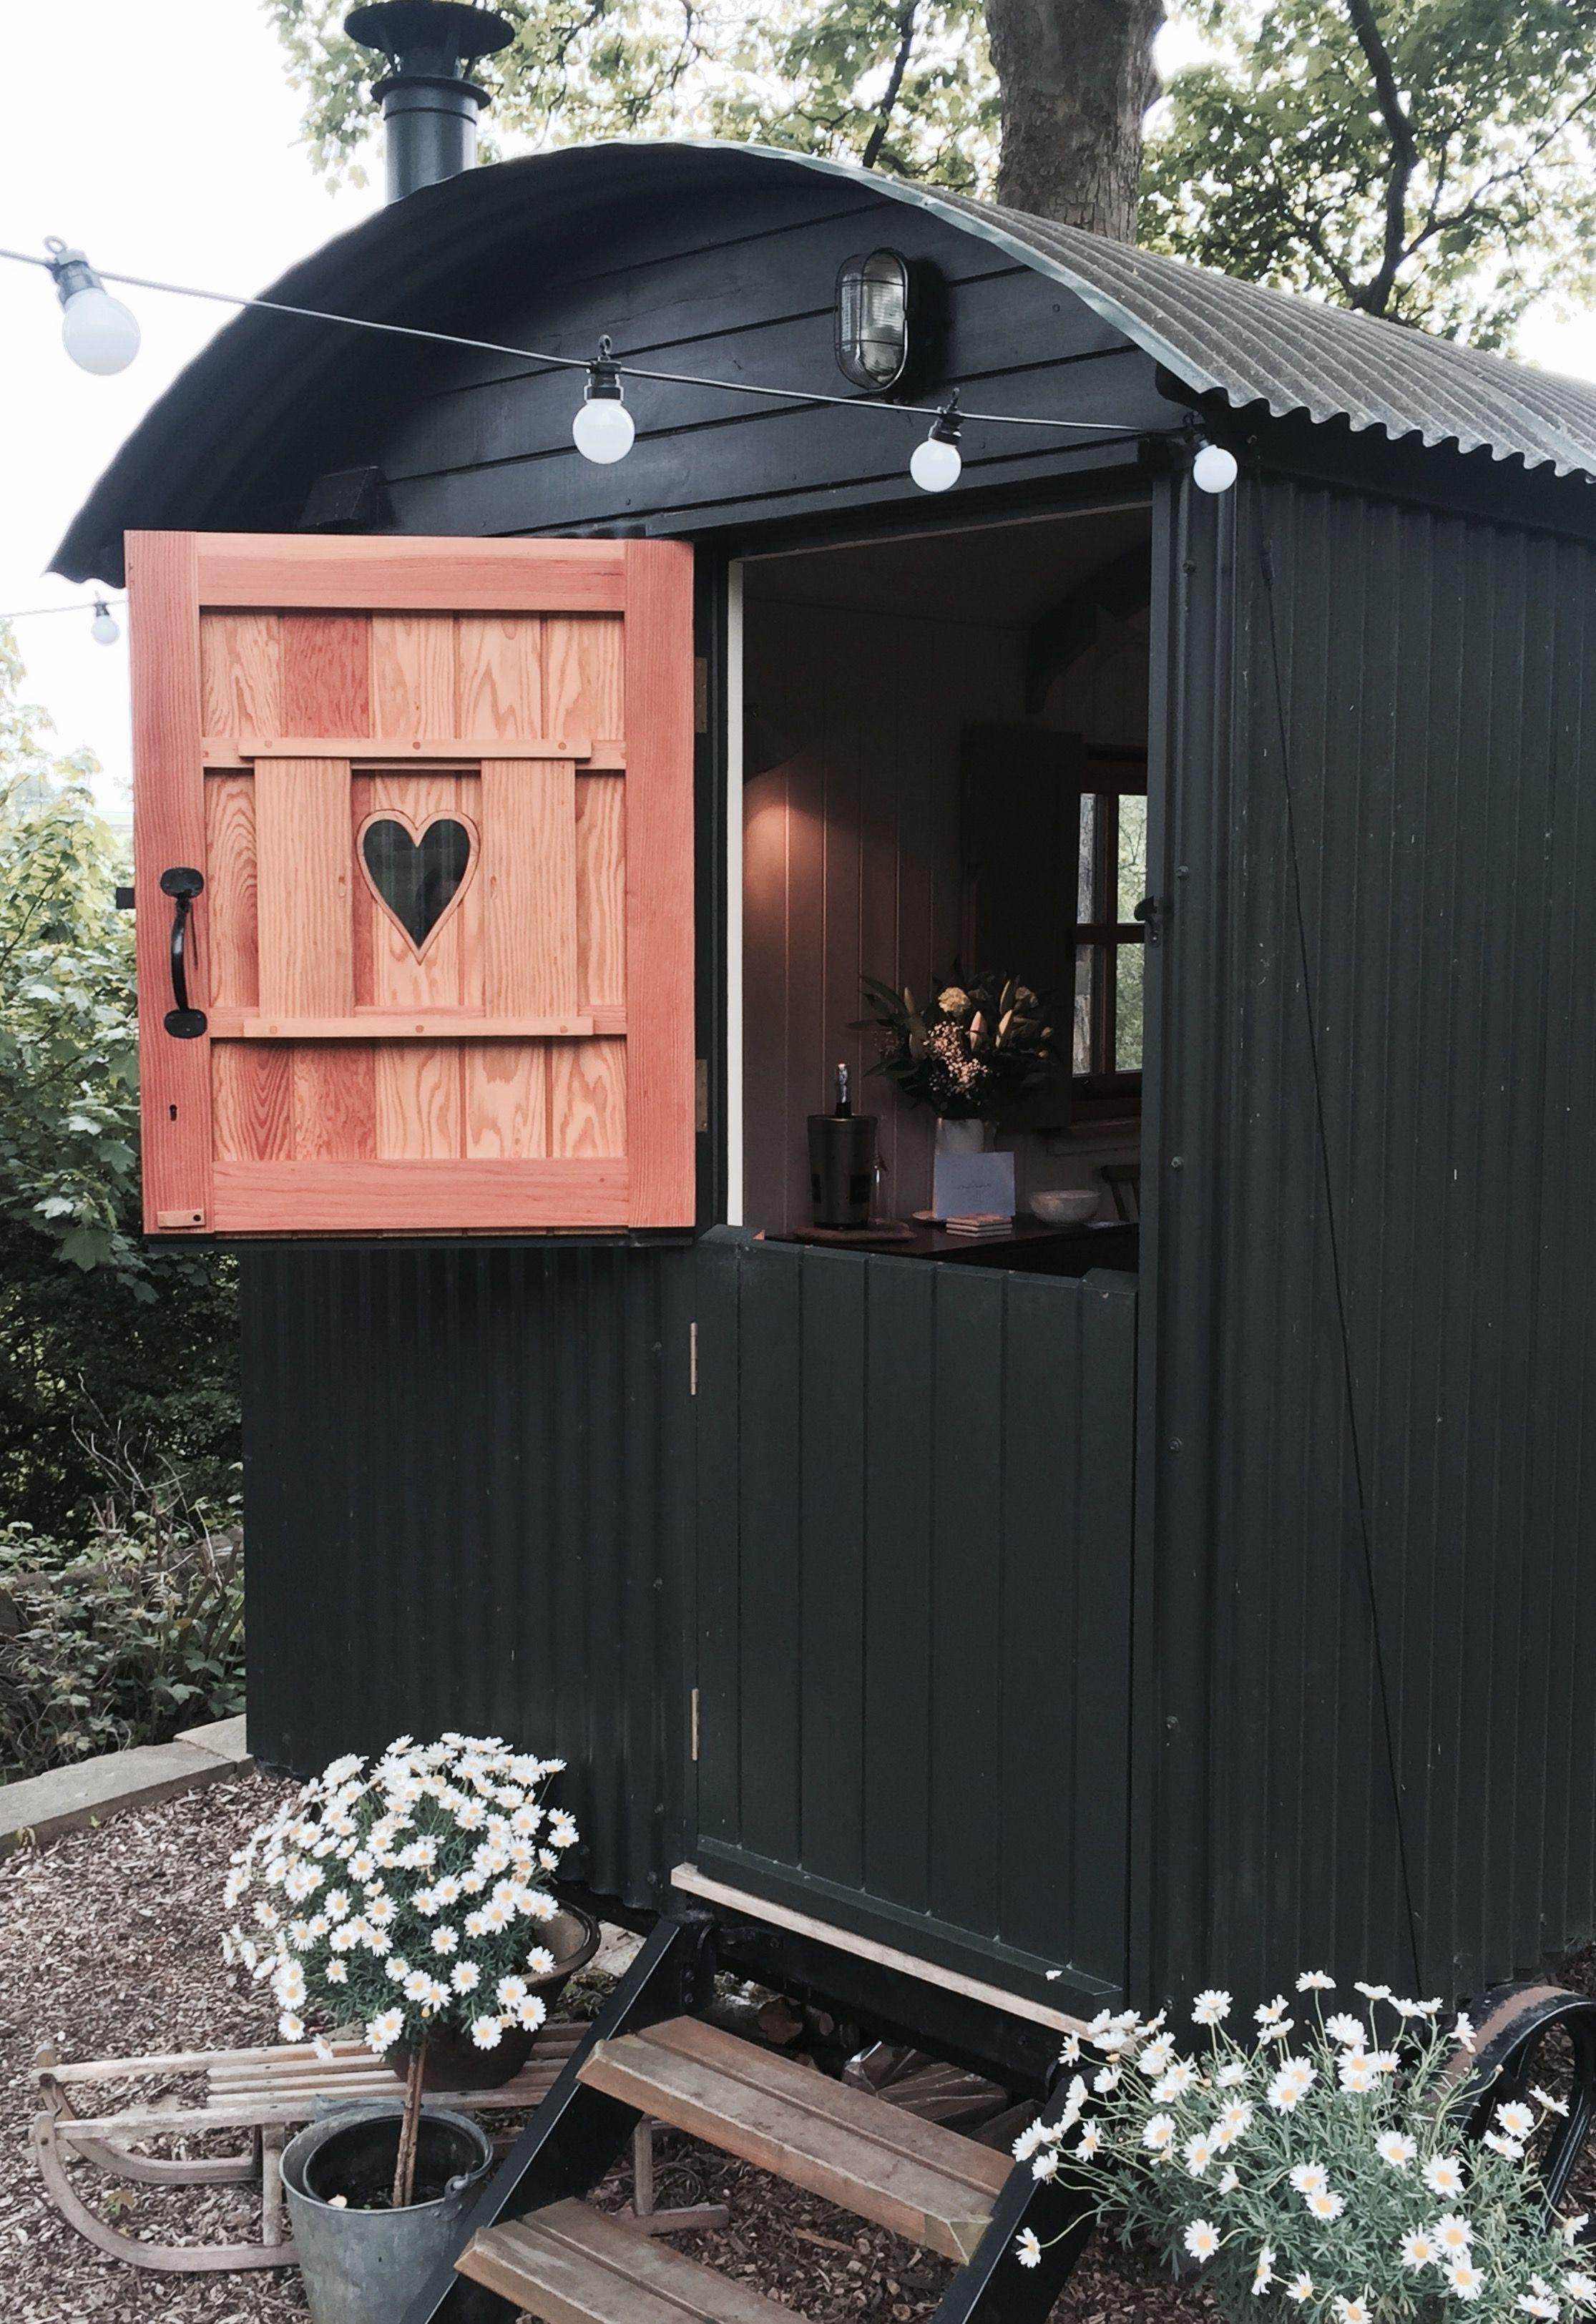 Eyam Shepherds hut ready for a honeymoon celebration....